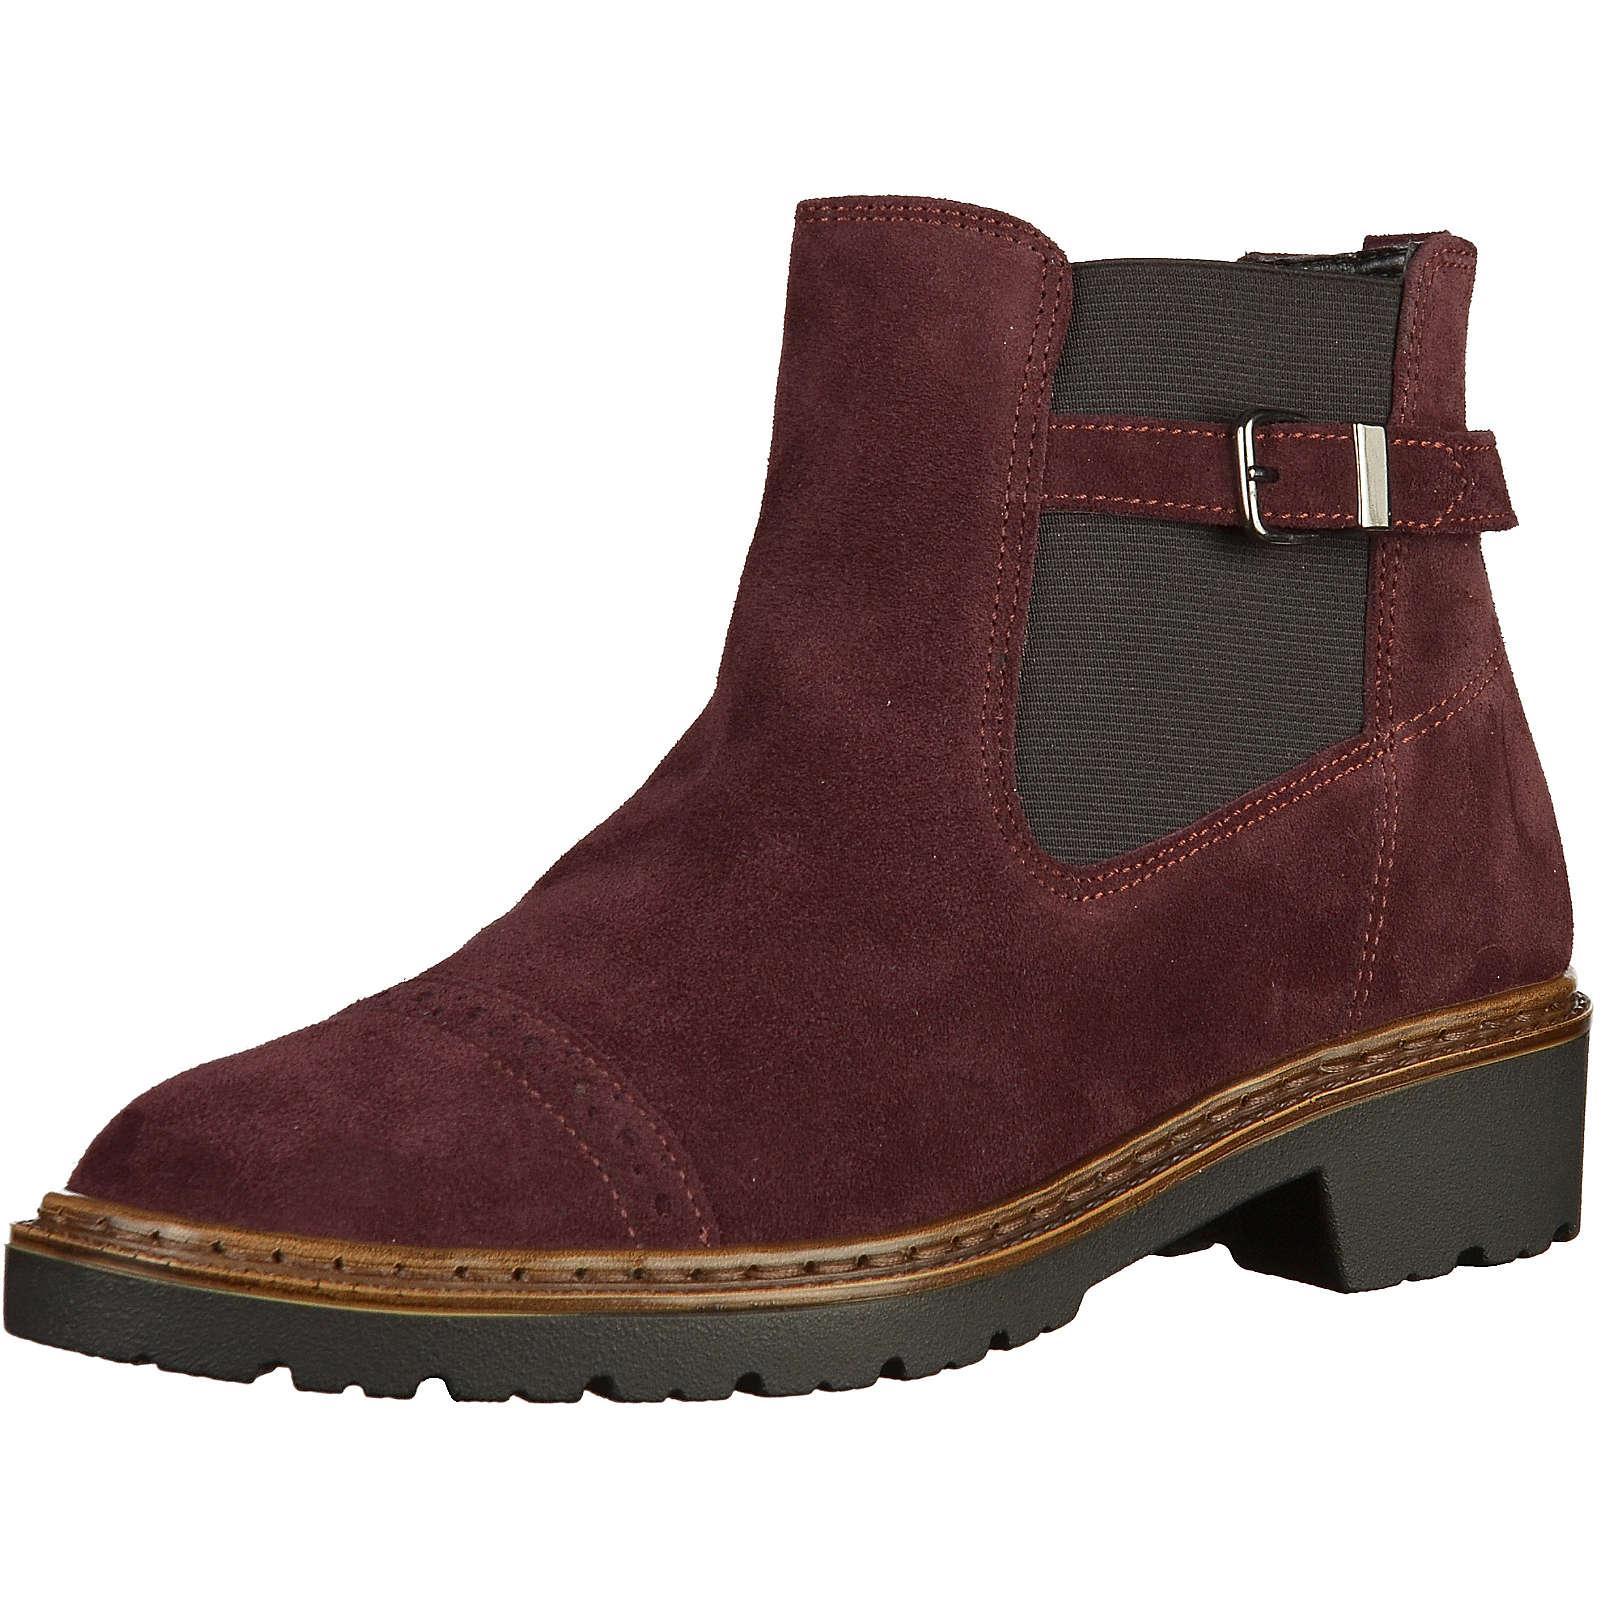 JENNY Chelsea Boots bordeaux Damen Gr. 36